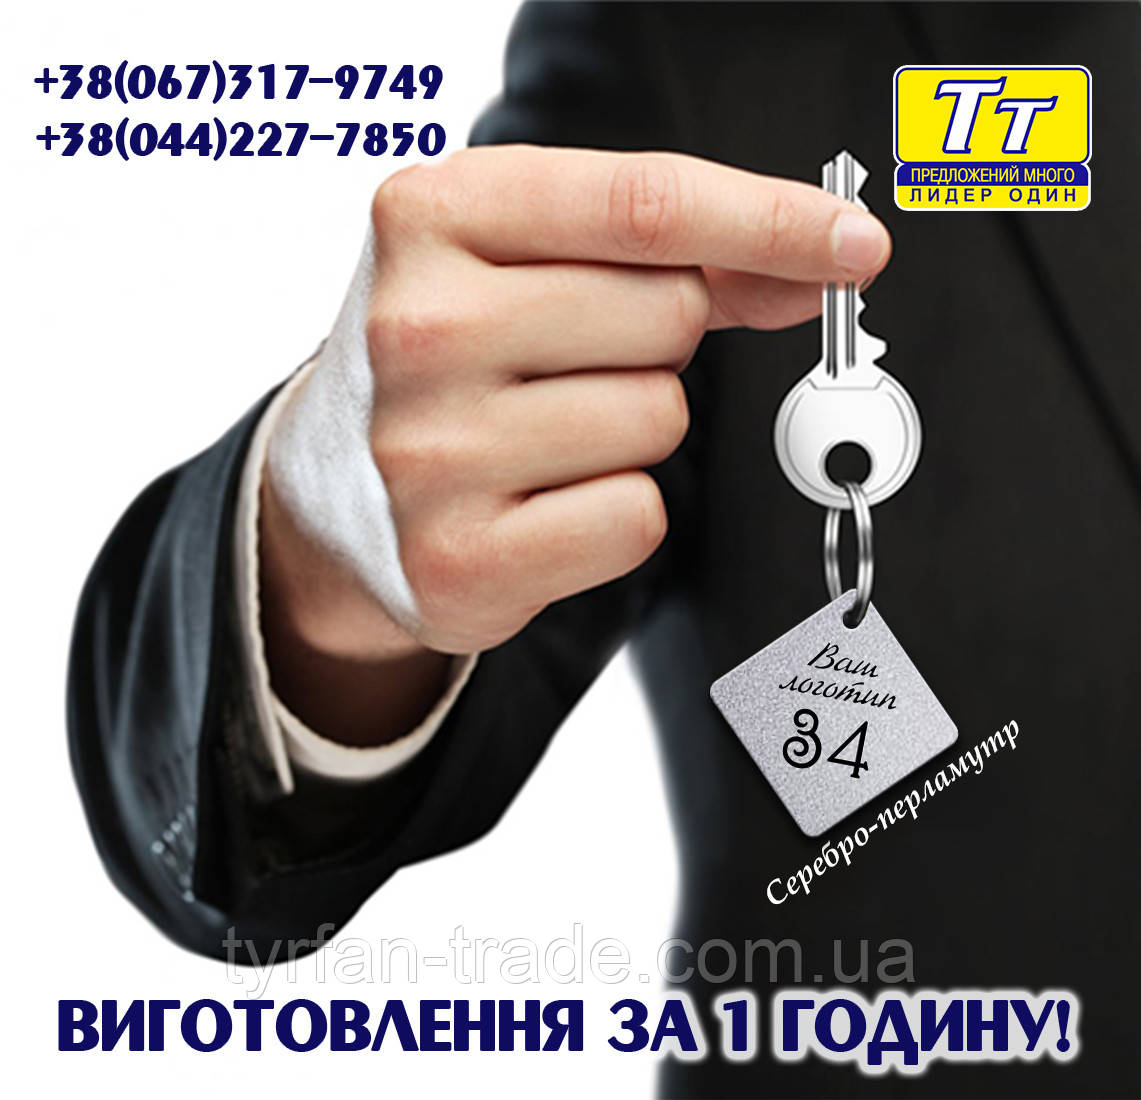 Бирки для ключей под серебро и золото с логотипом и номером изготовим за 1 час